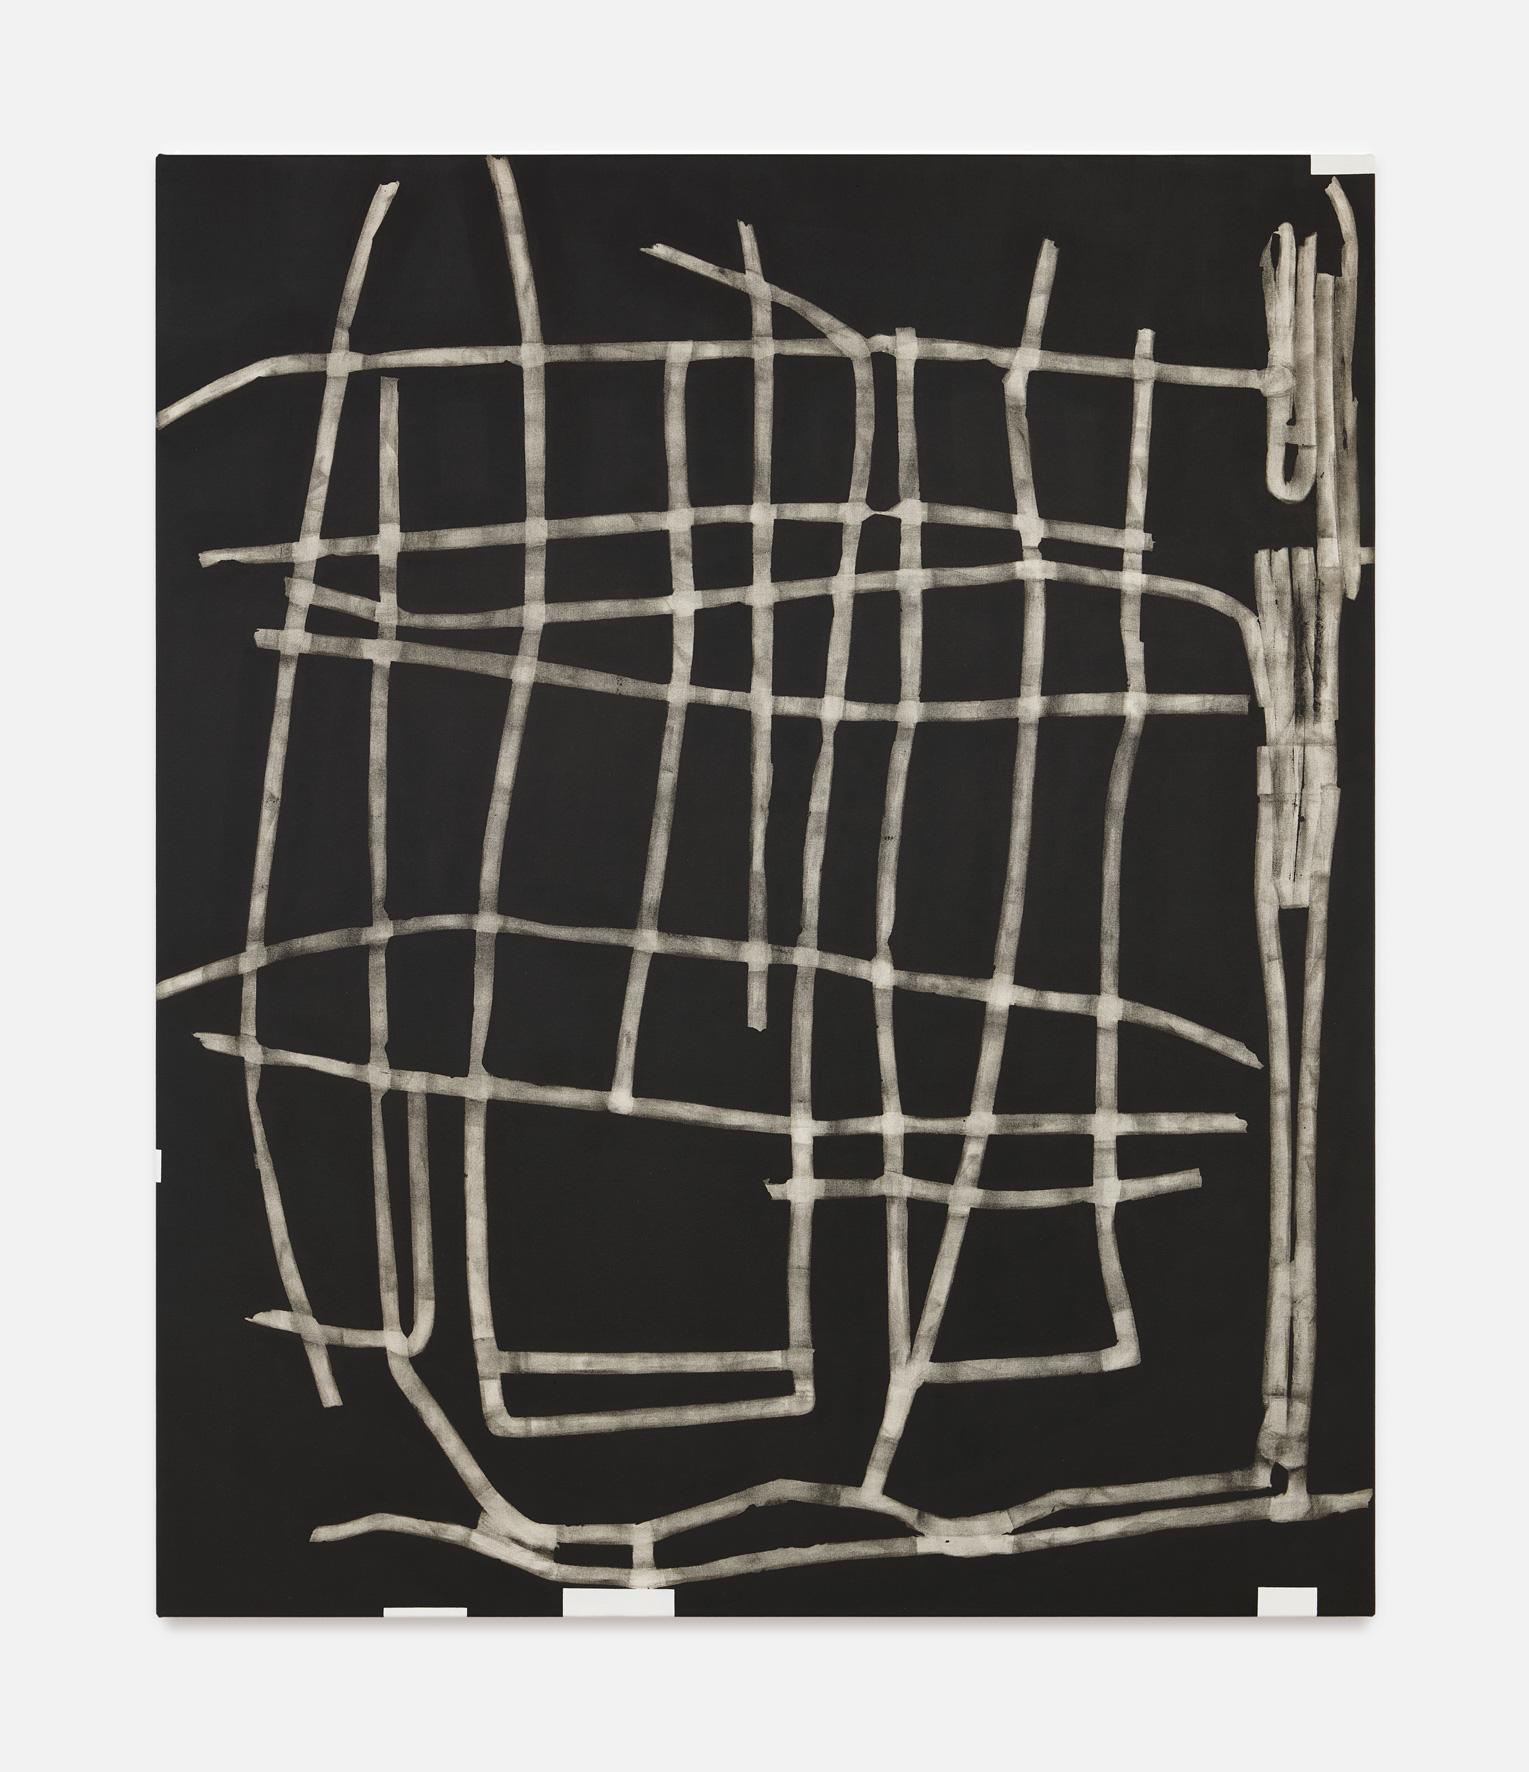 Dusty K I | 2018 | Öl und Acryl auf Leinwand | 180 x 150 cm | ©GALERIE ALBER